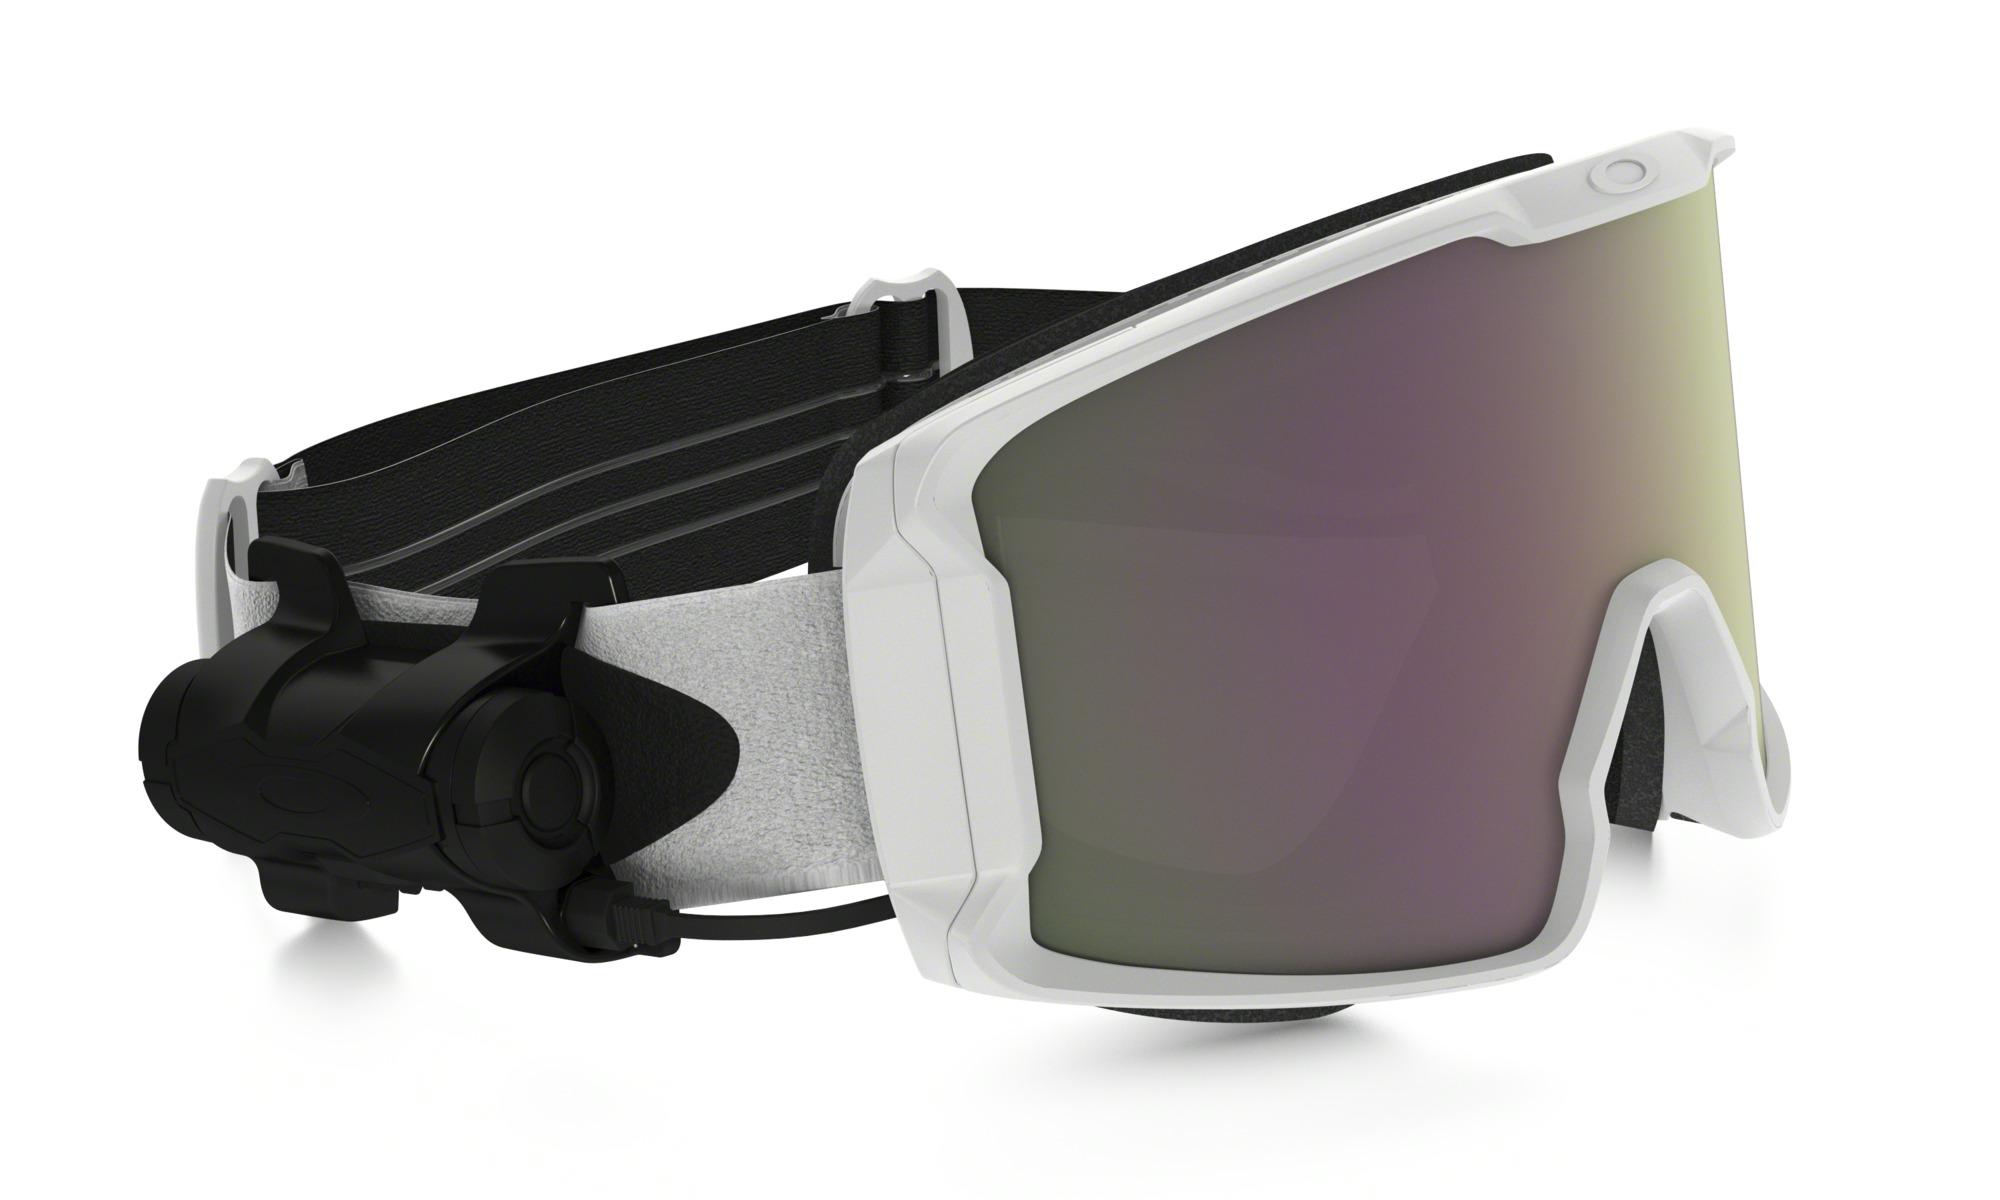 Oakley PRIZM Inferno Line Miner Snow Goggles, Oakley prescription goggles, Prizm Snow